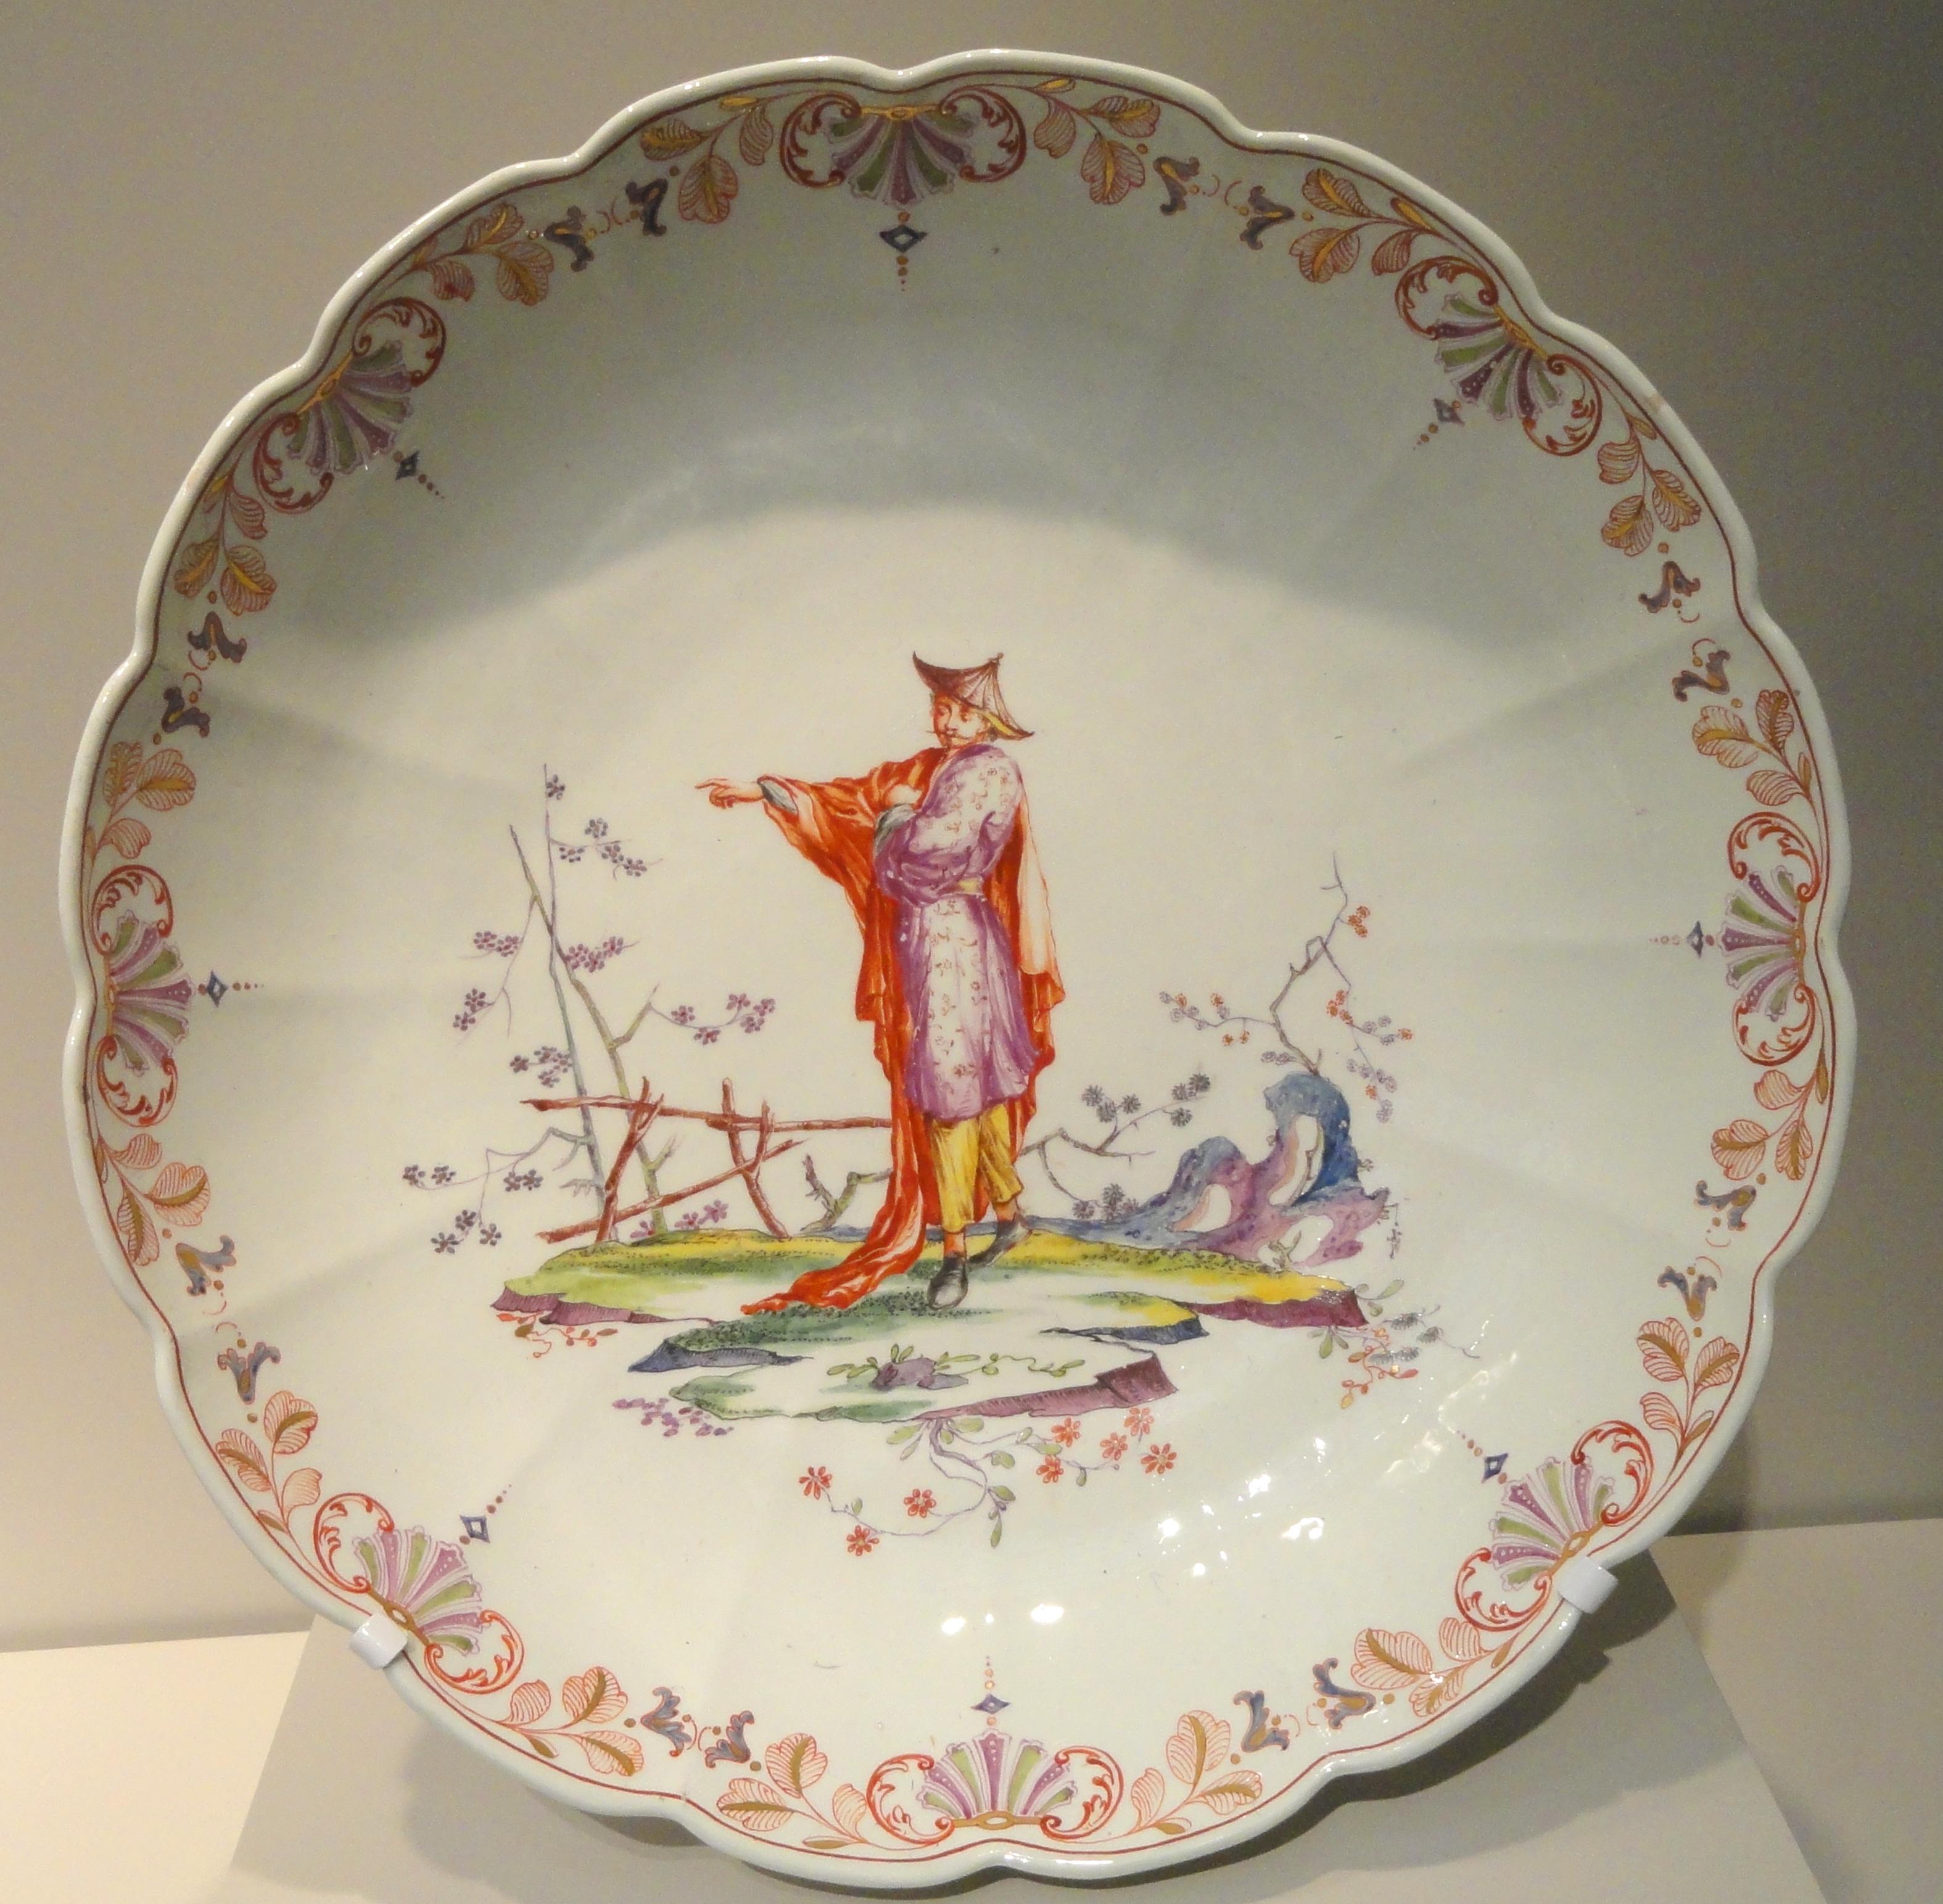 Vienna porcelain - Wikipedia